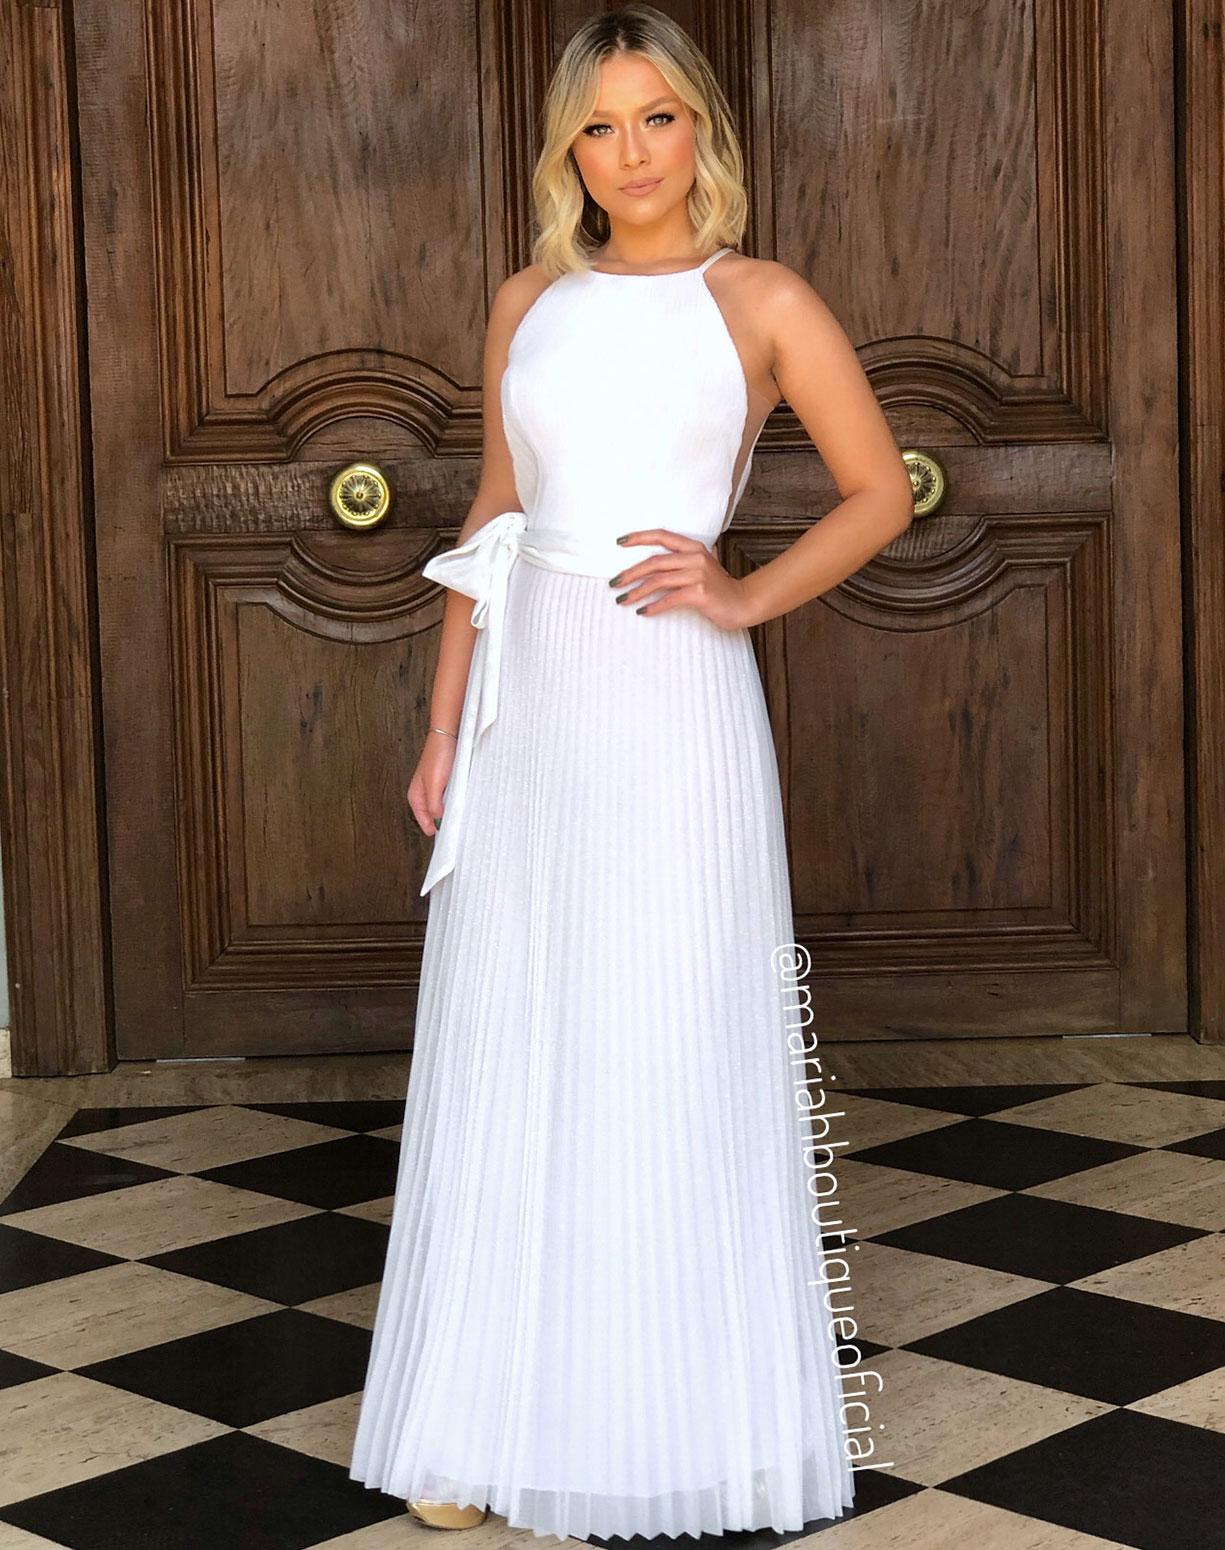 Vestido Branco em Tule com Glitter